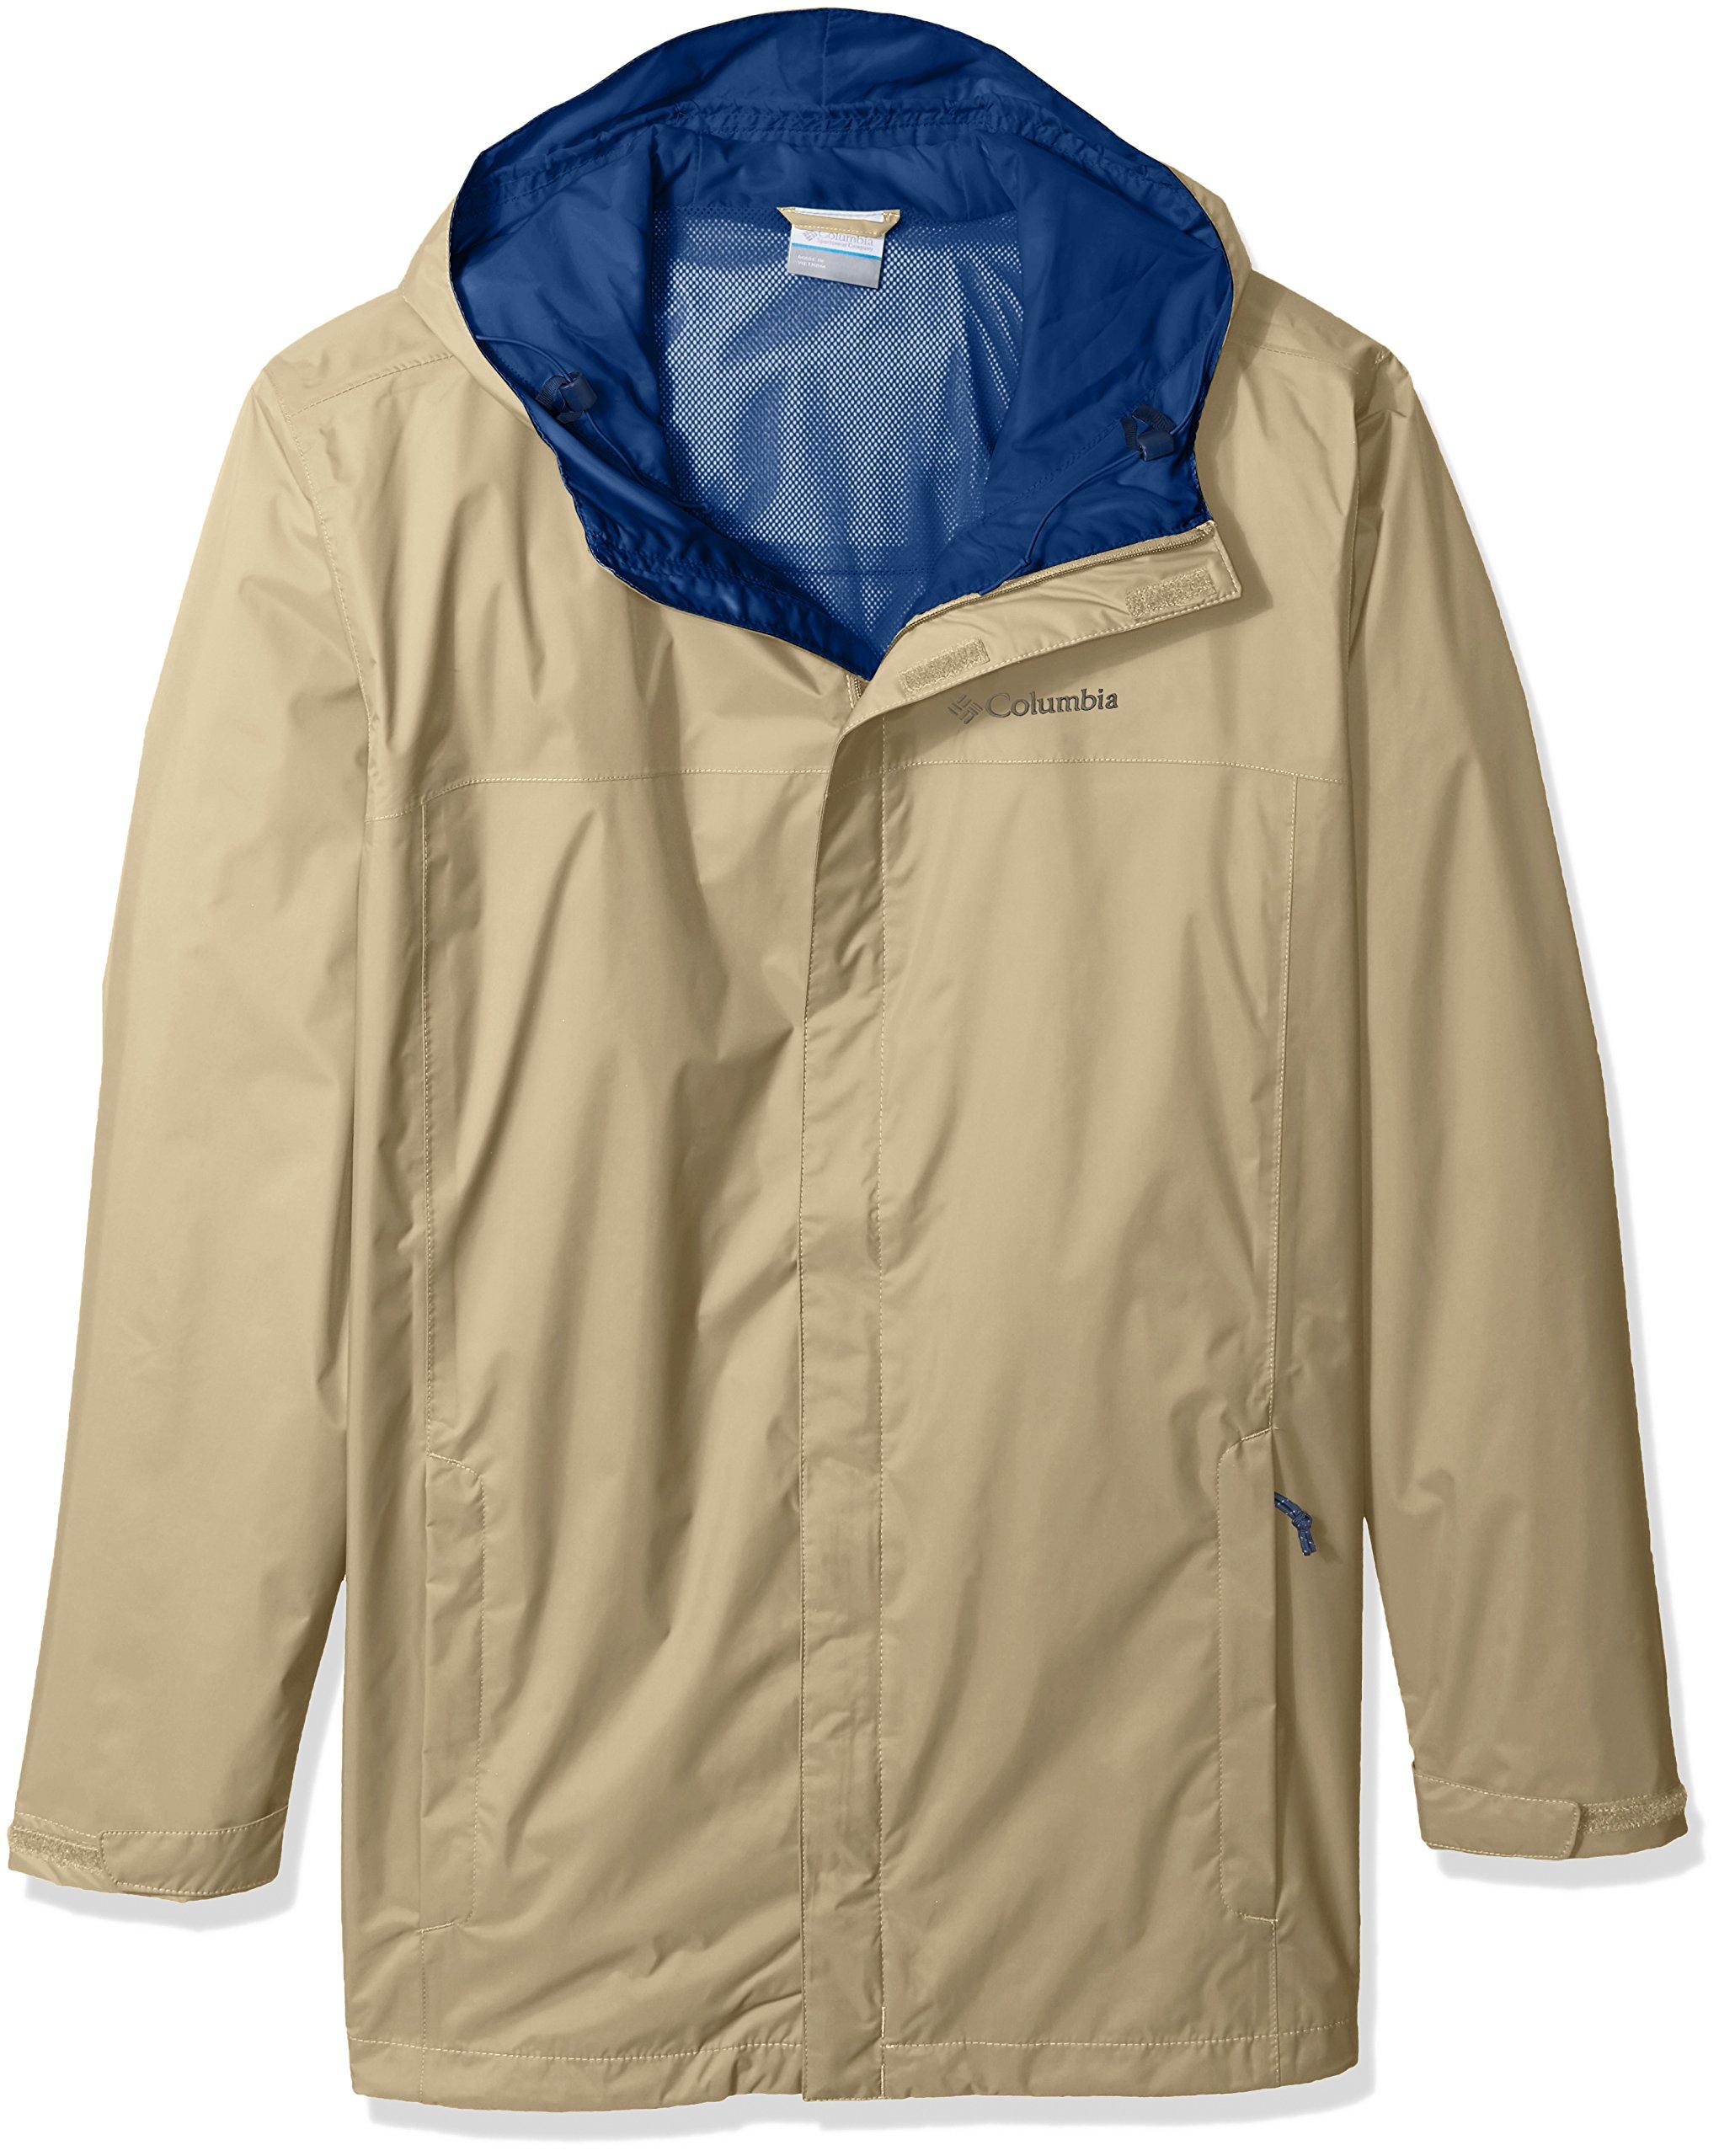 Columbia Men's Big and Tall Watertight Ii Jacket, British Tan 3X